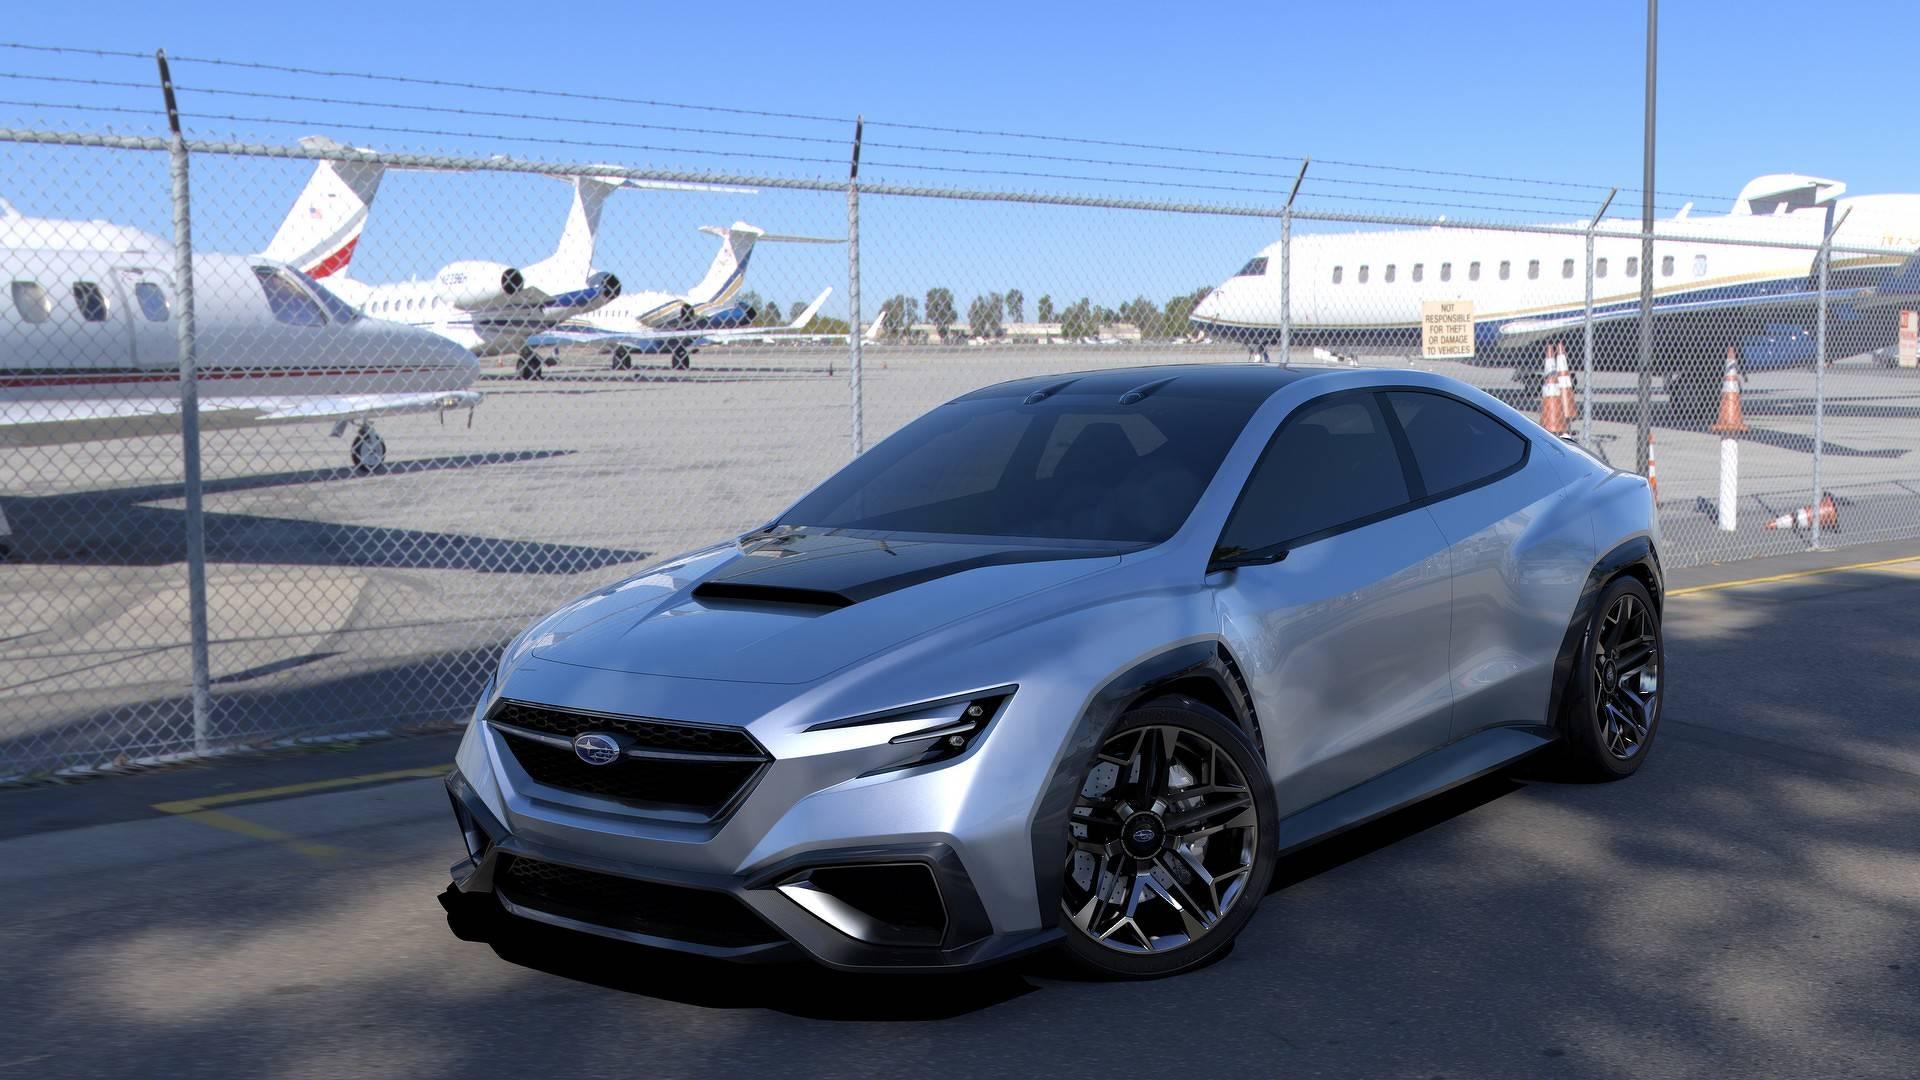 Subaru Impreza Wrx Sti 2021 Engine